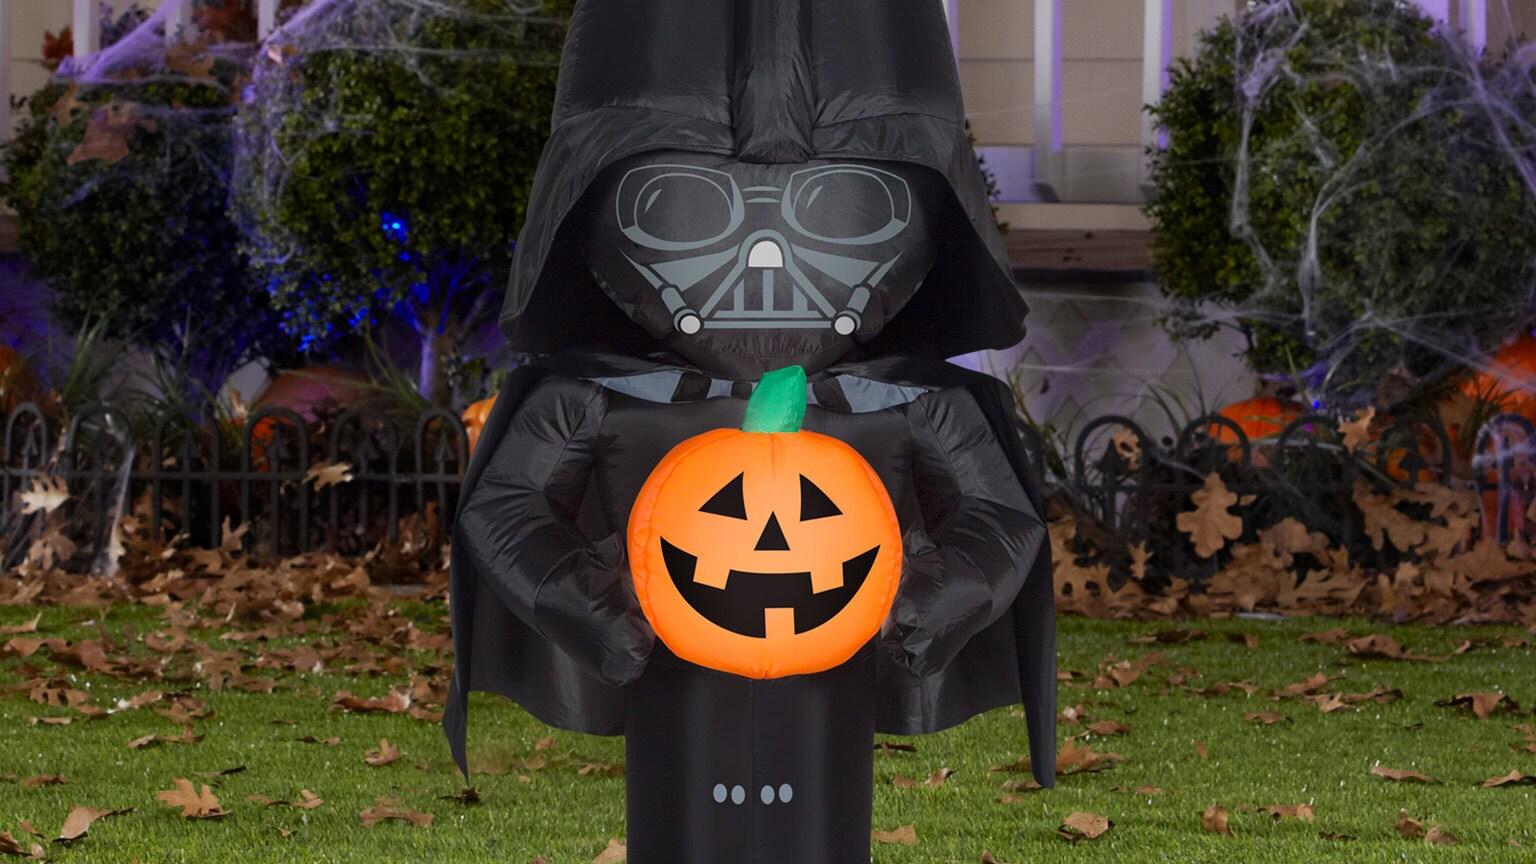 Star Wars Halloween Shopping Guide 2019